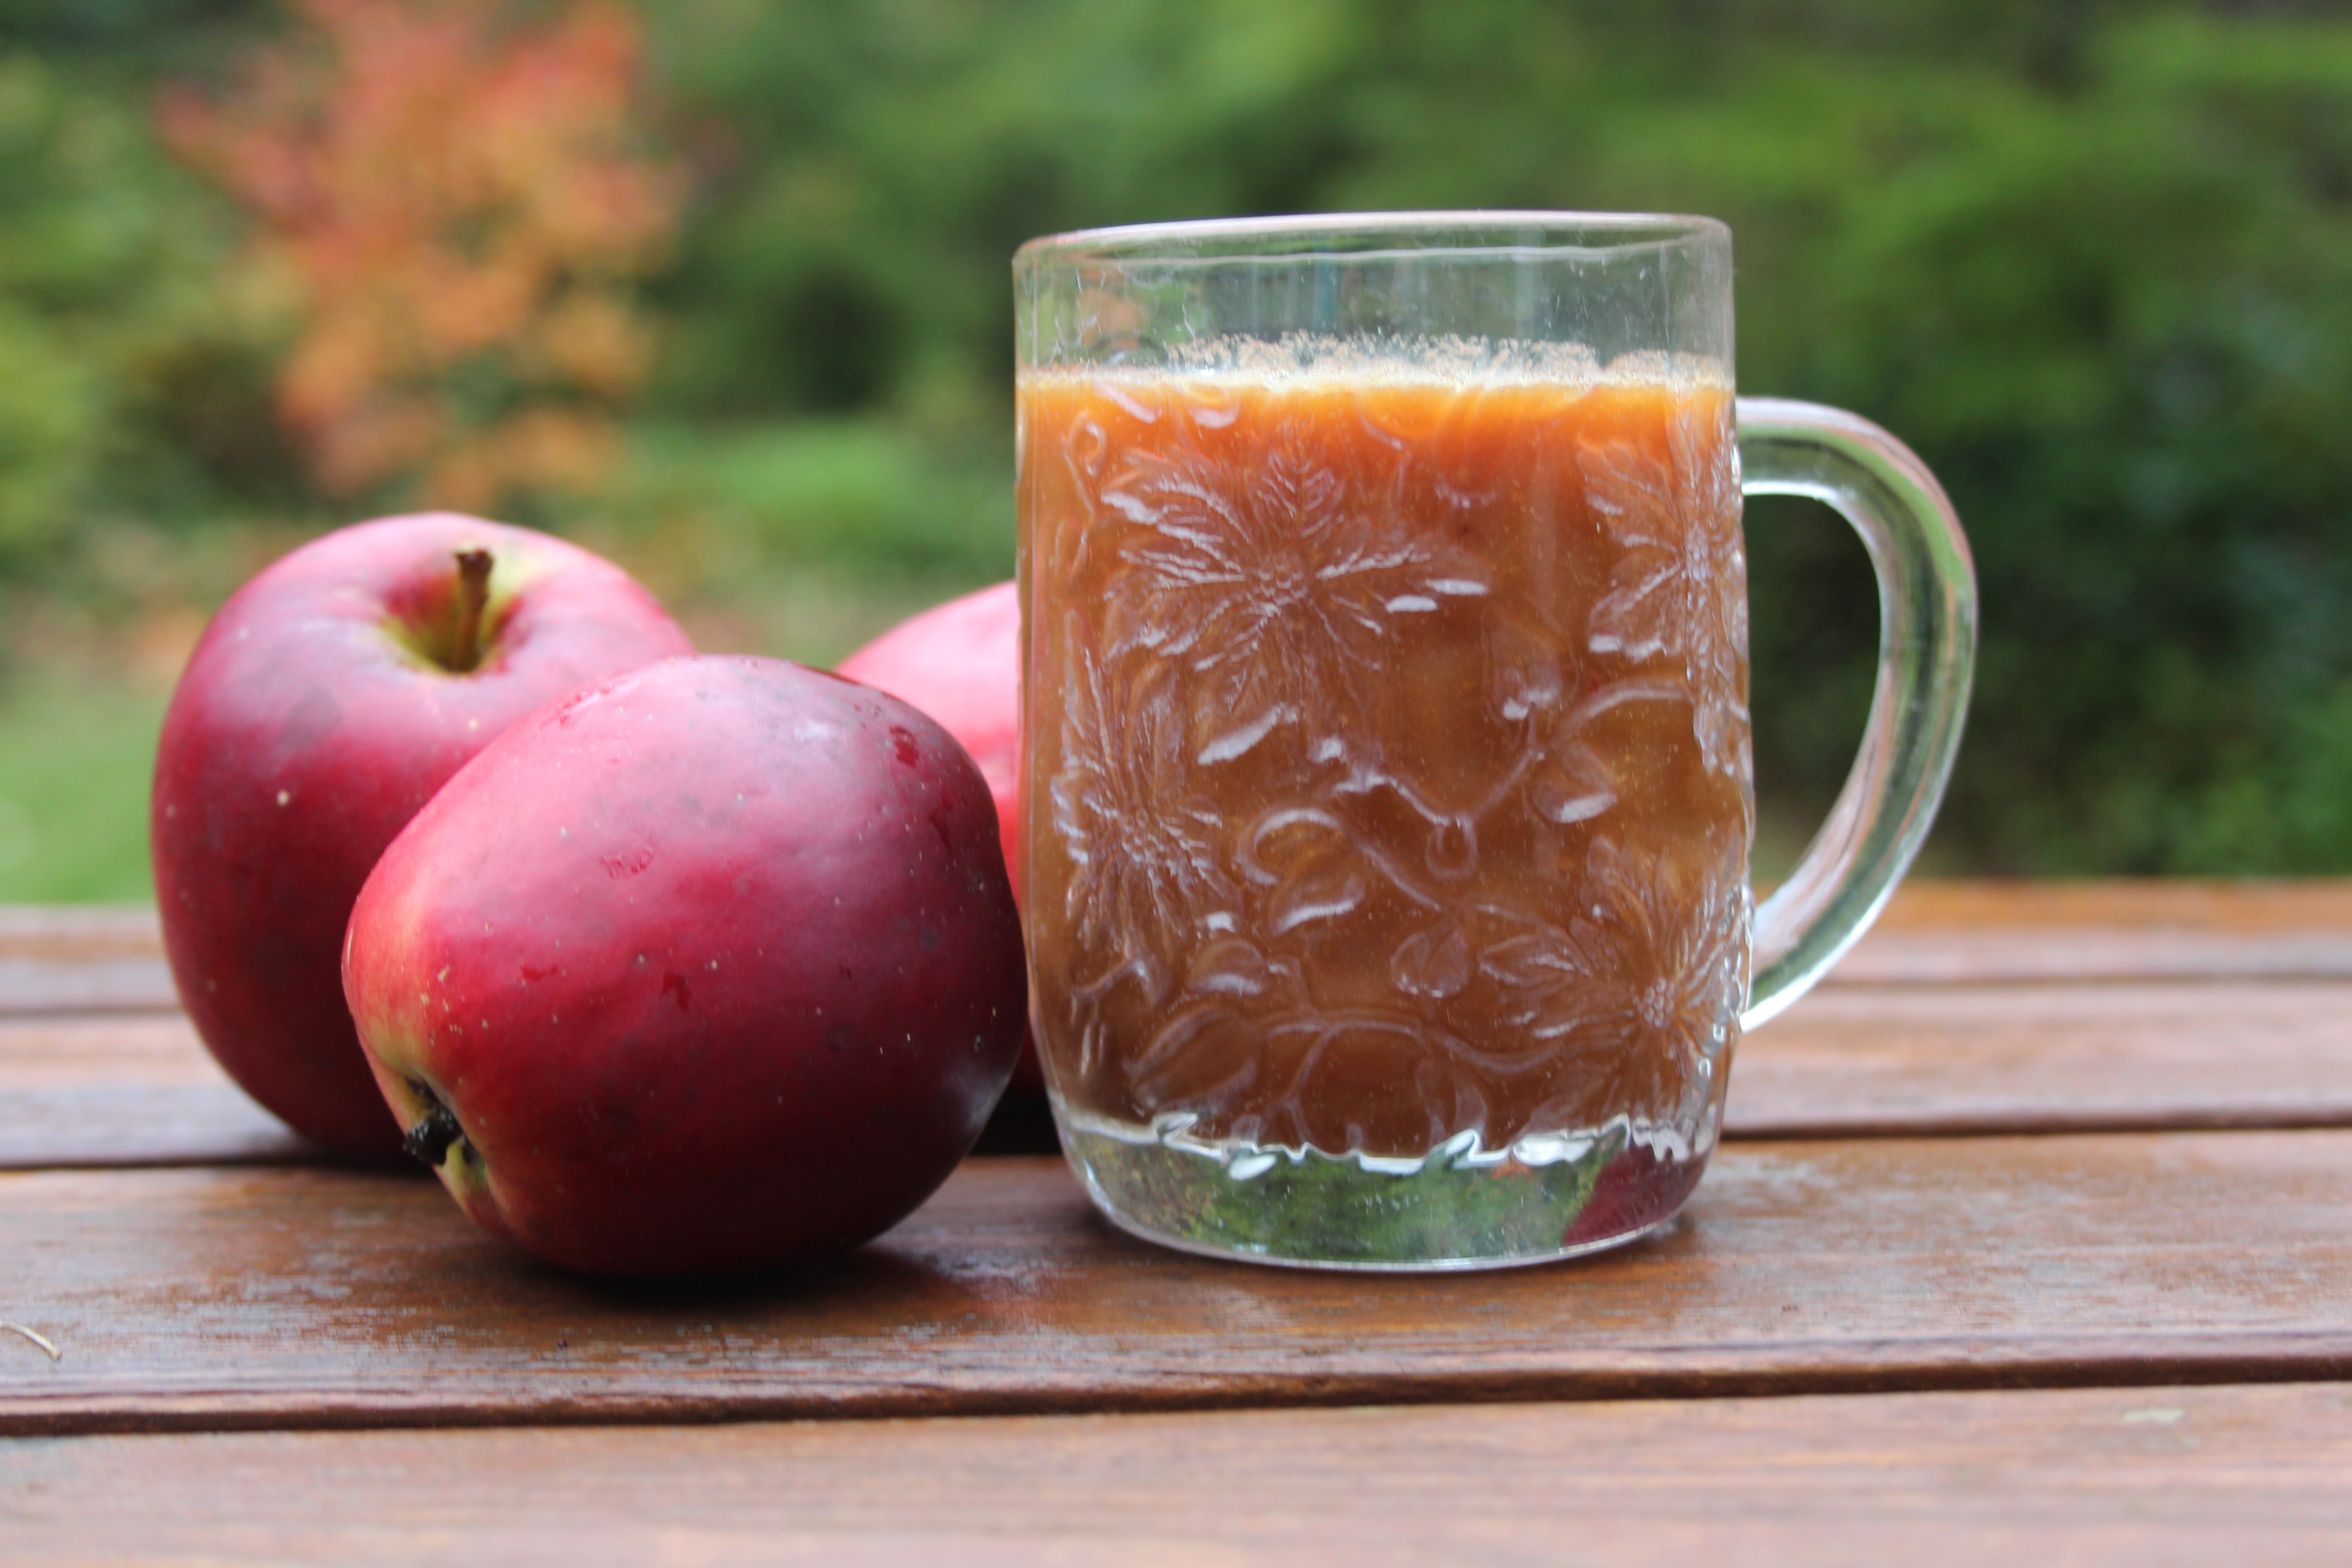 Apple Cider from Apples (no cider press)